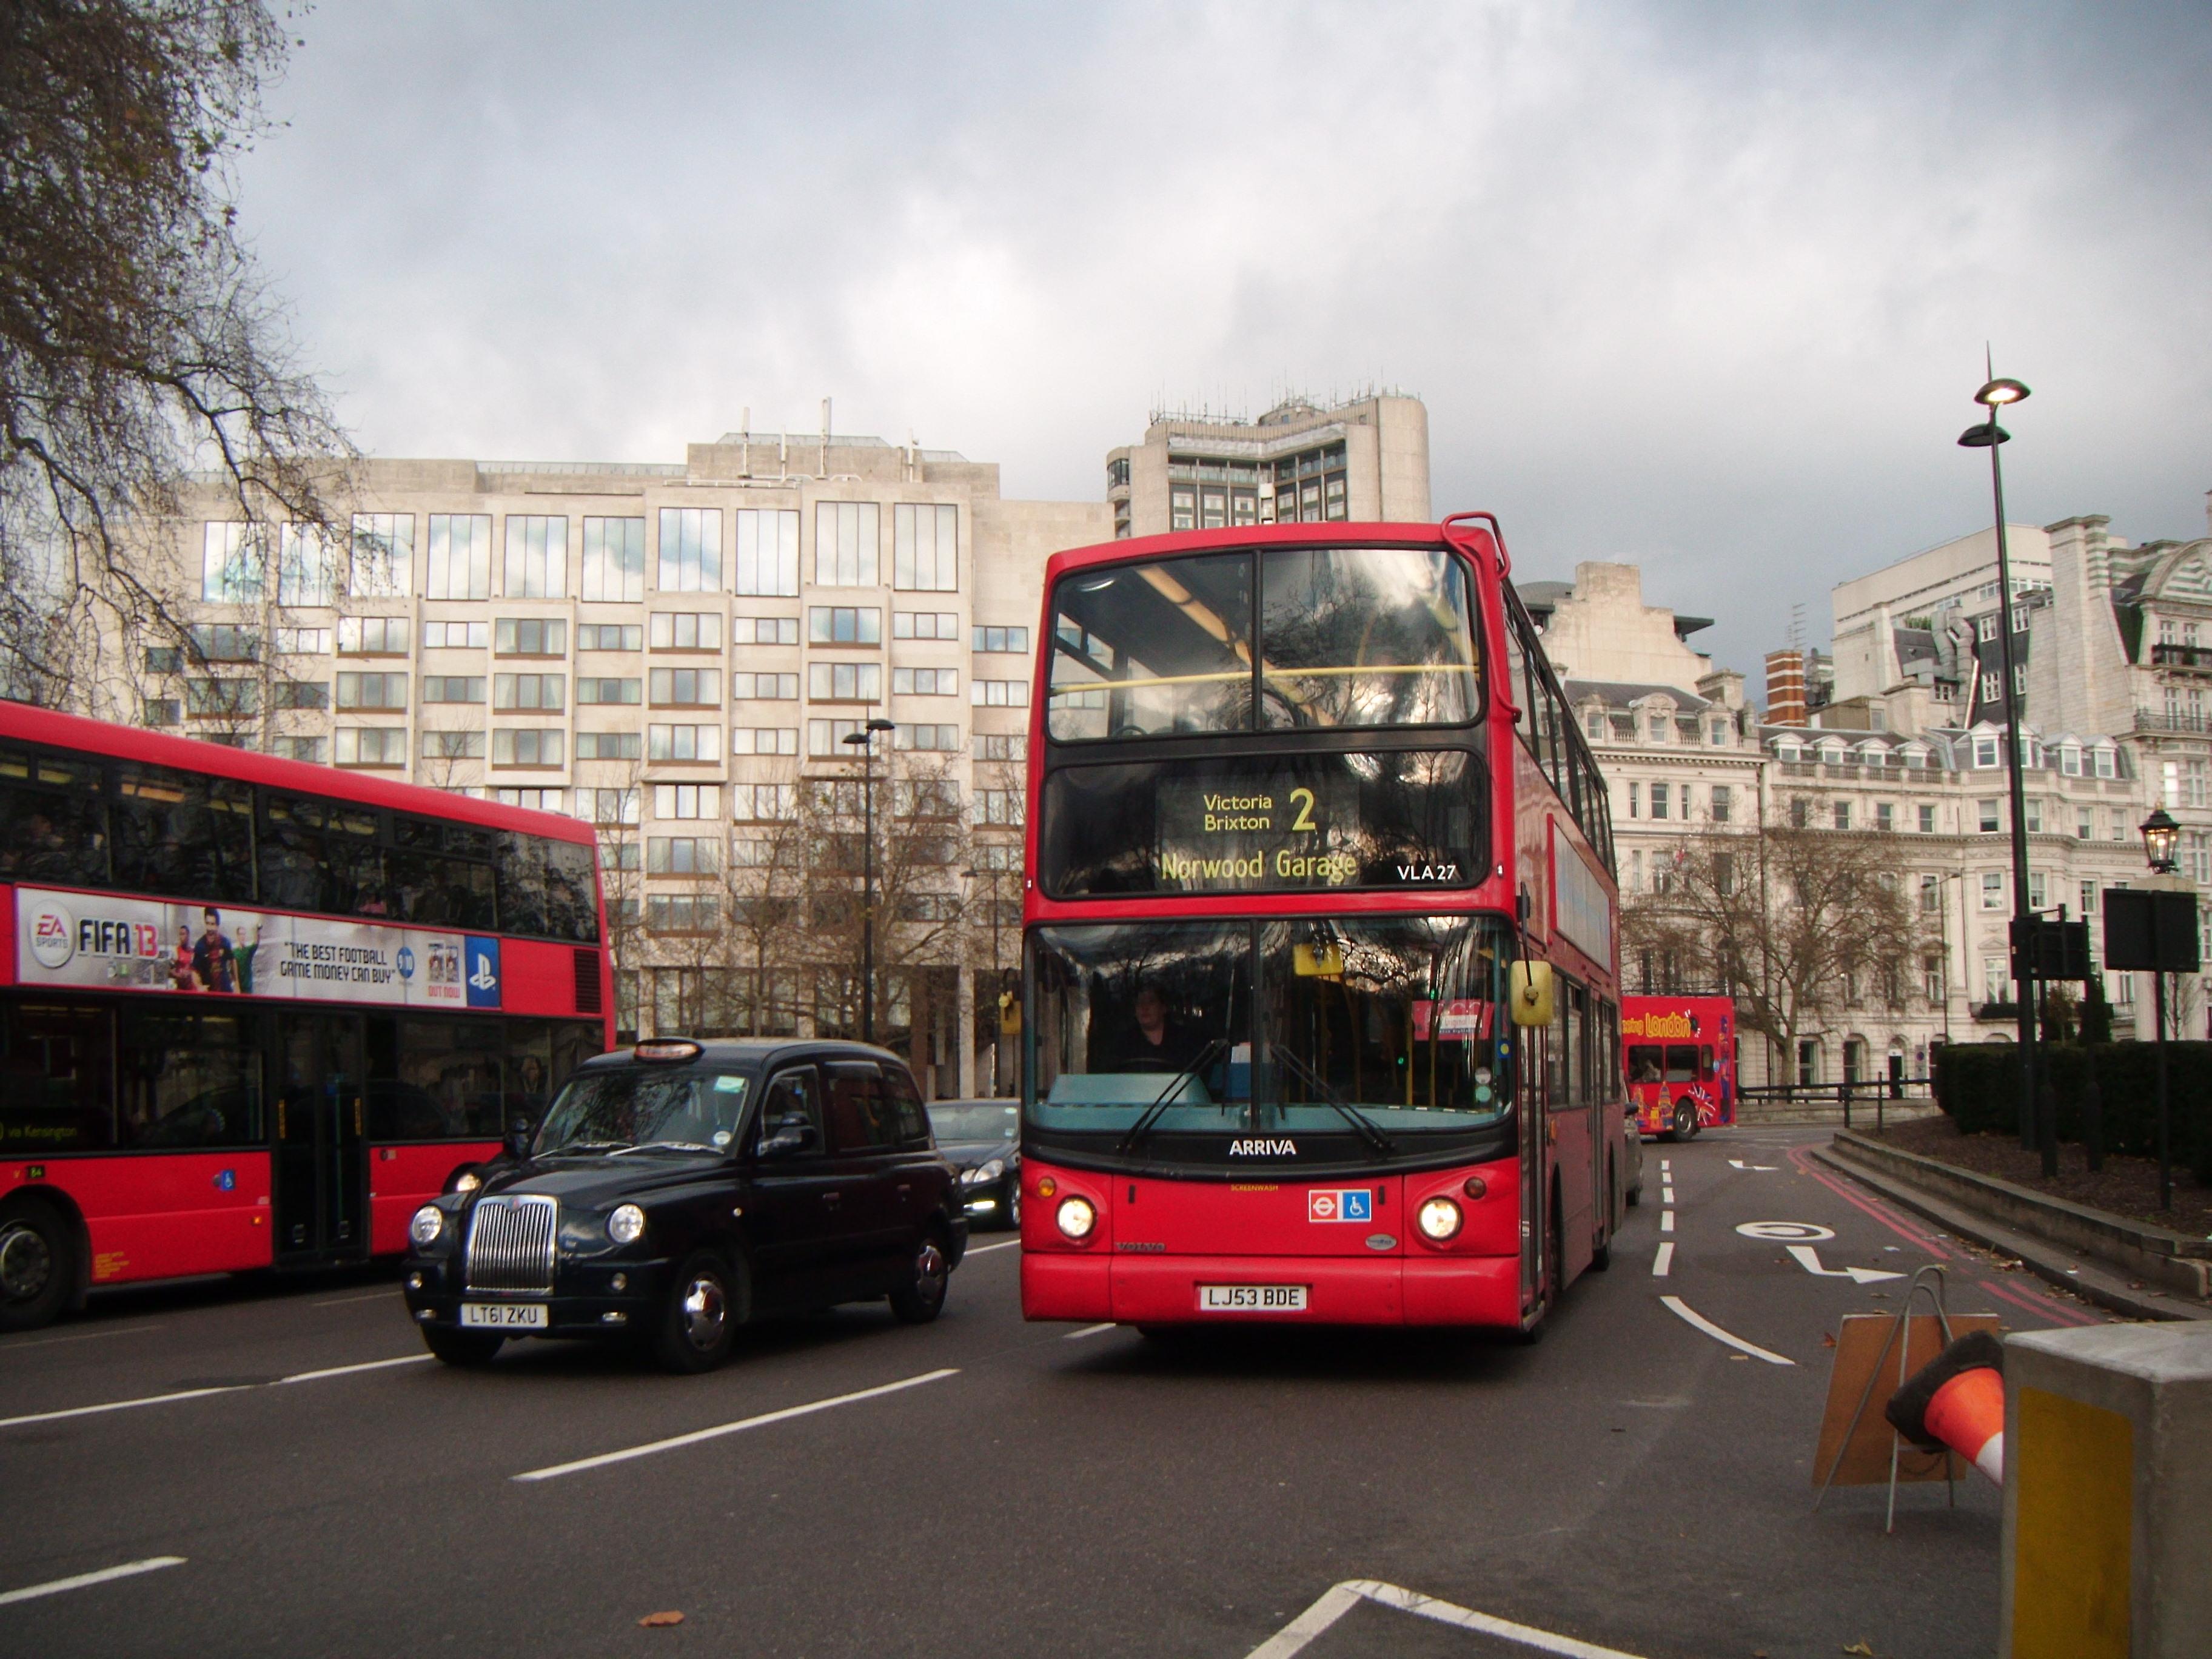 Muoversi a Londra: trasporti, metro, tariffe